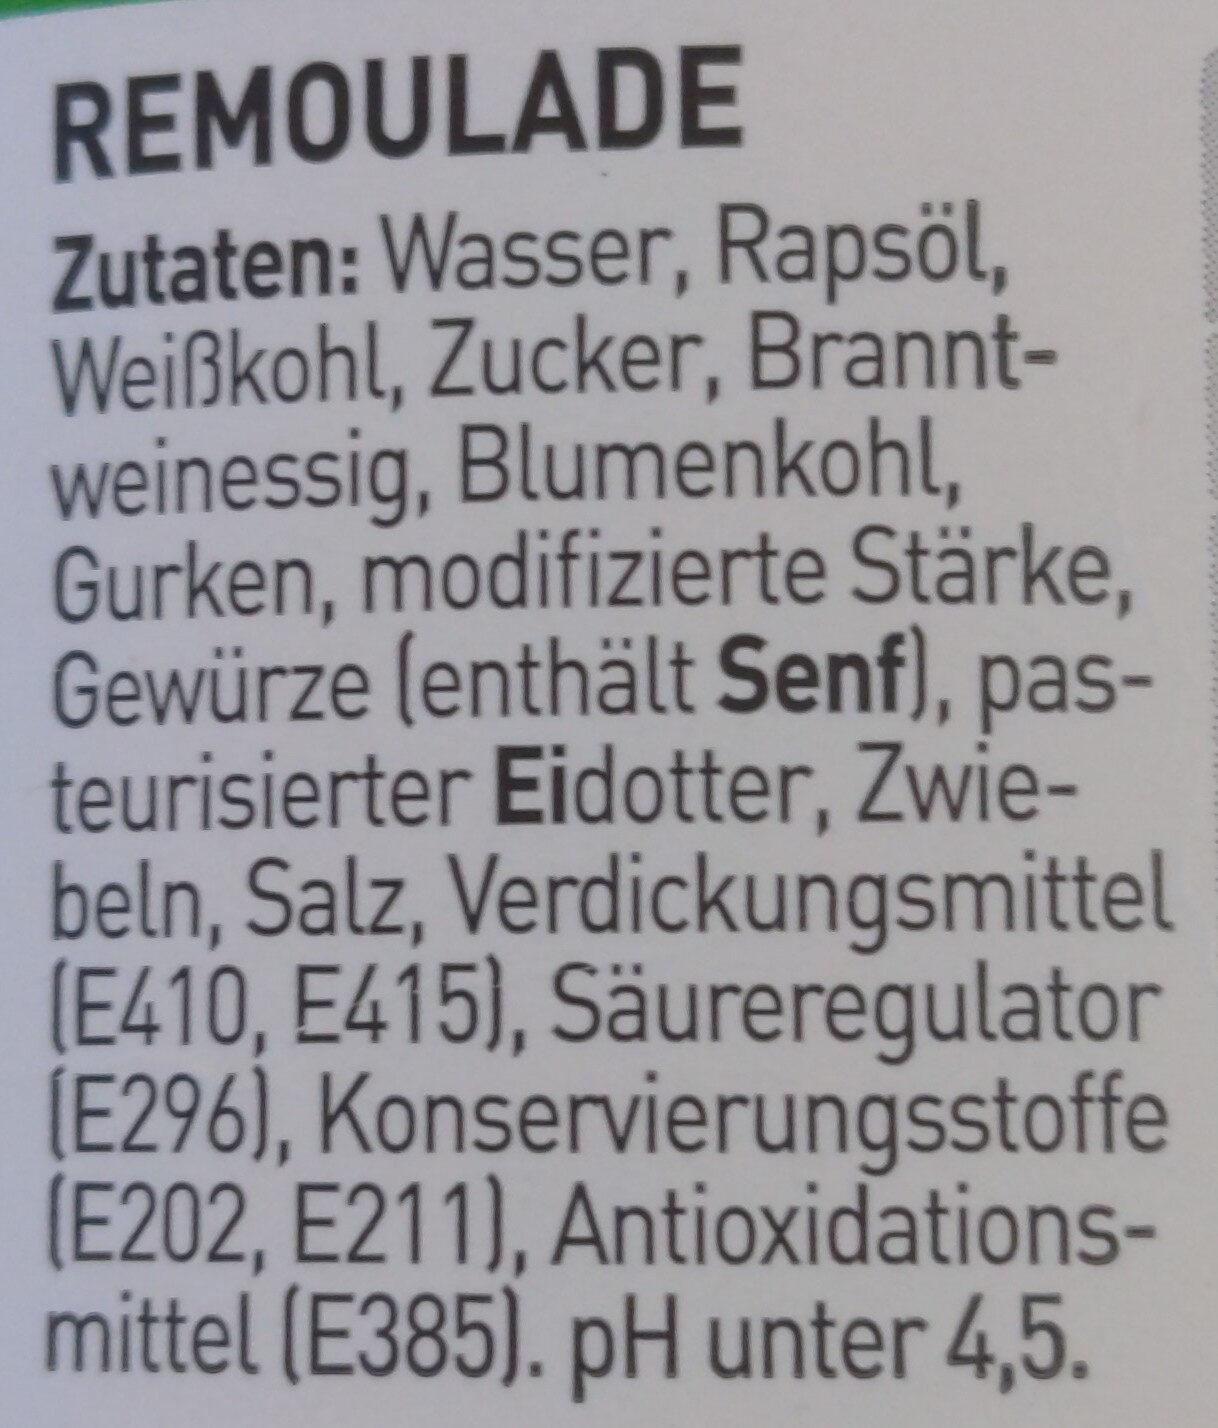 Remoulade Dänischer Art - Ingredients - de